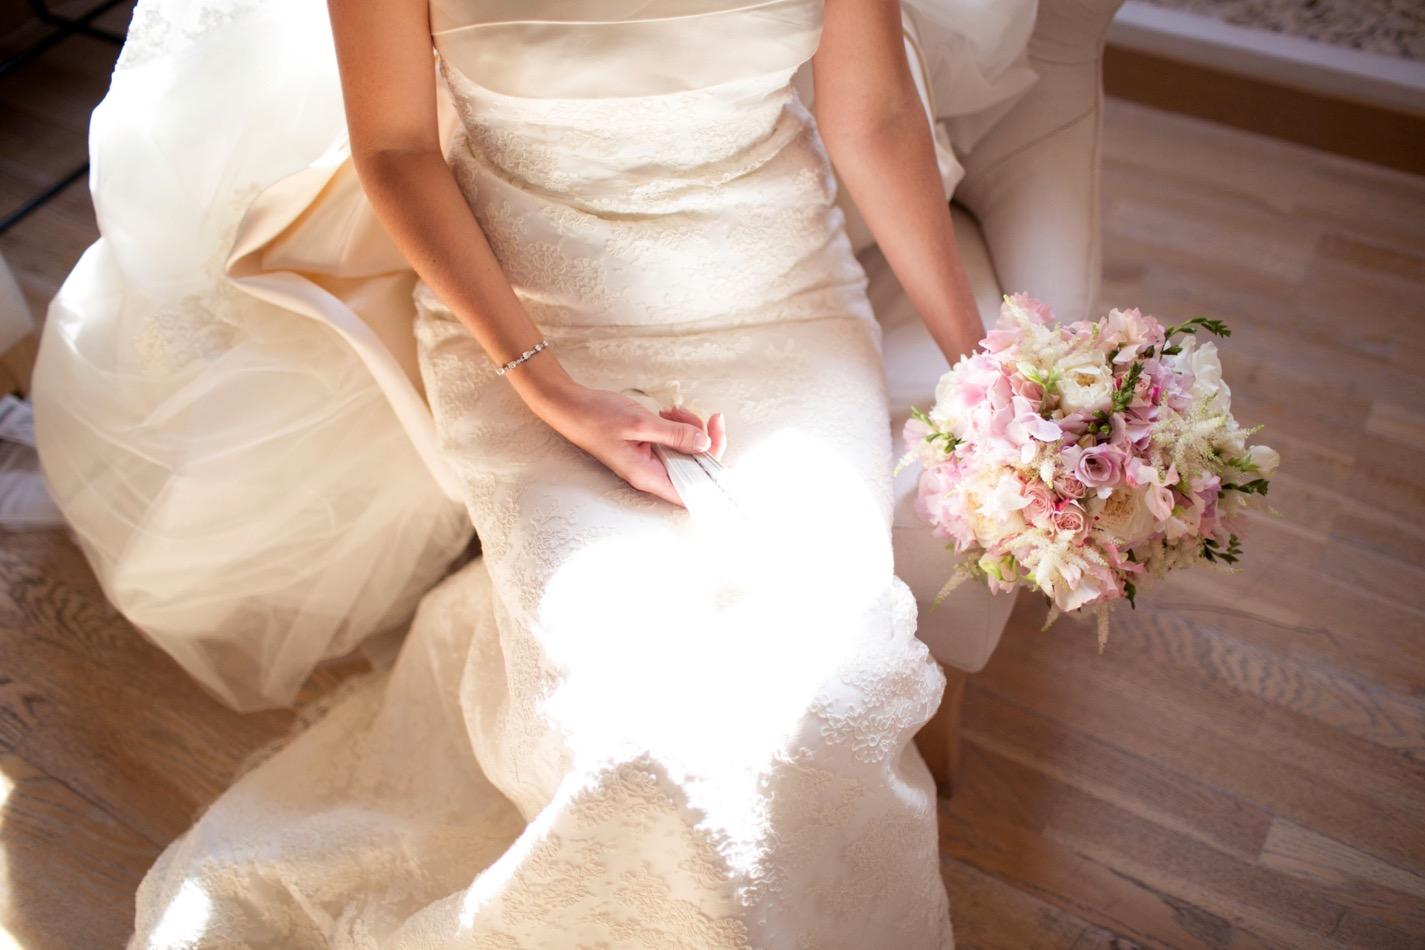 Si-Quiero-Wedding-Planner-By-Sira-Antequera-Vanesa-Jose-3